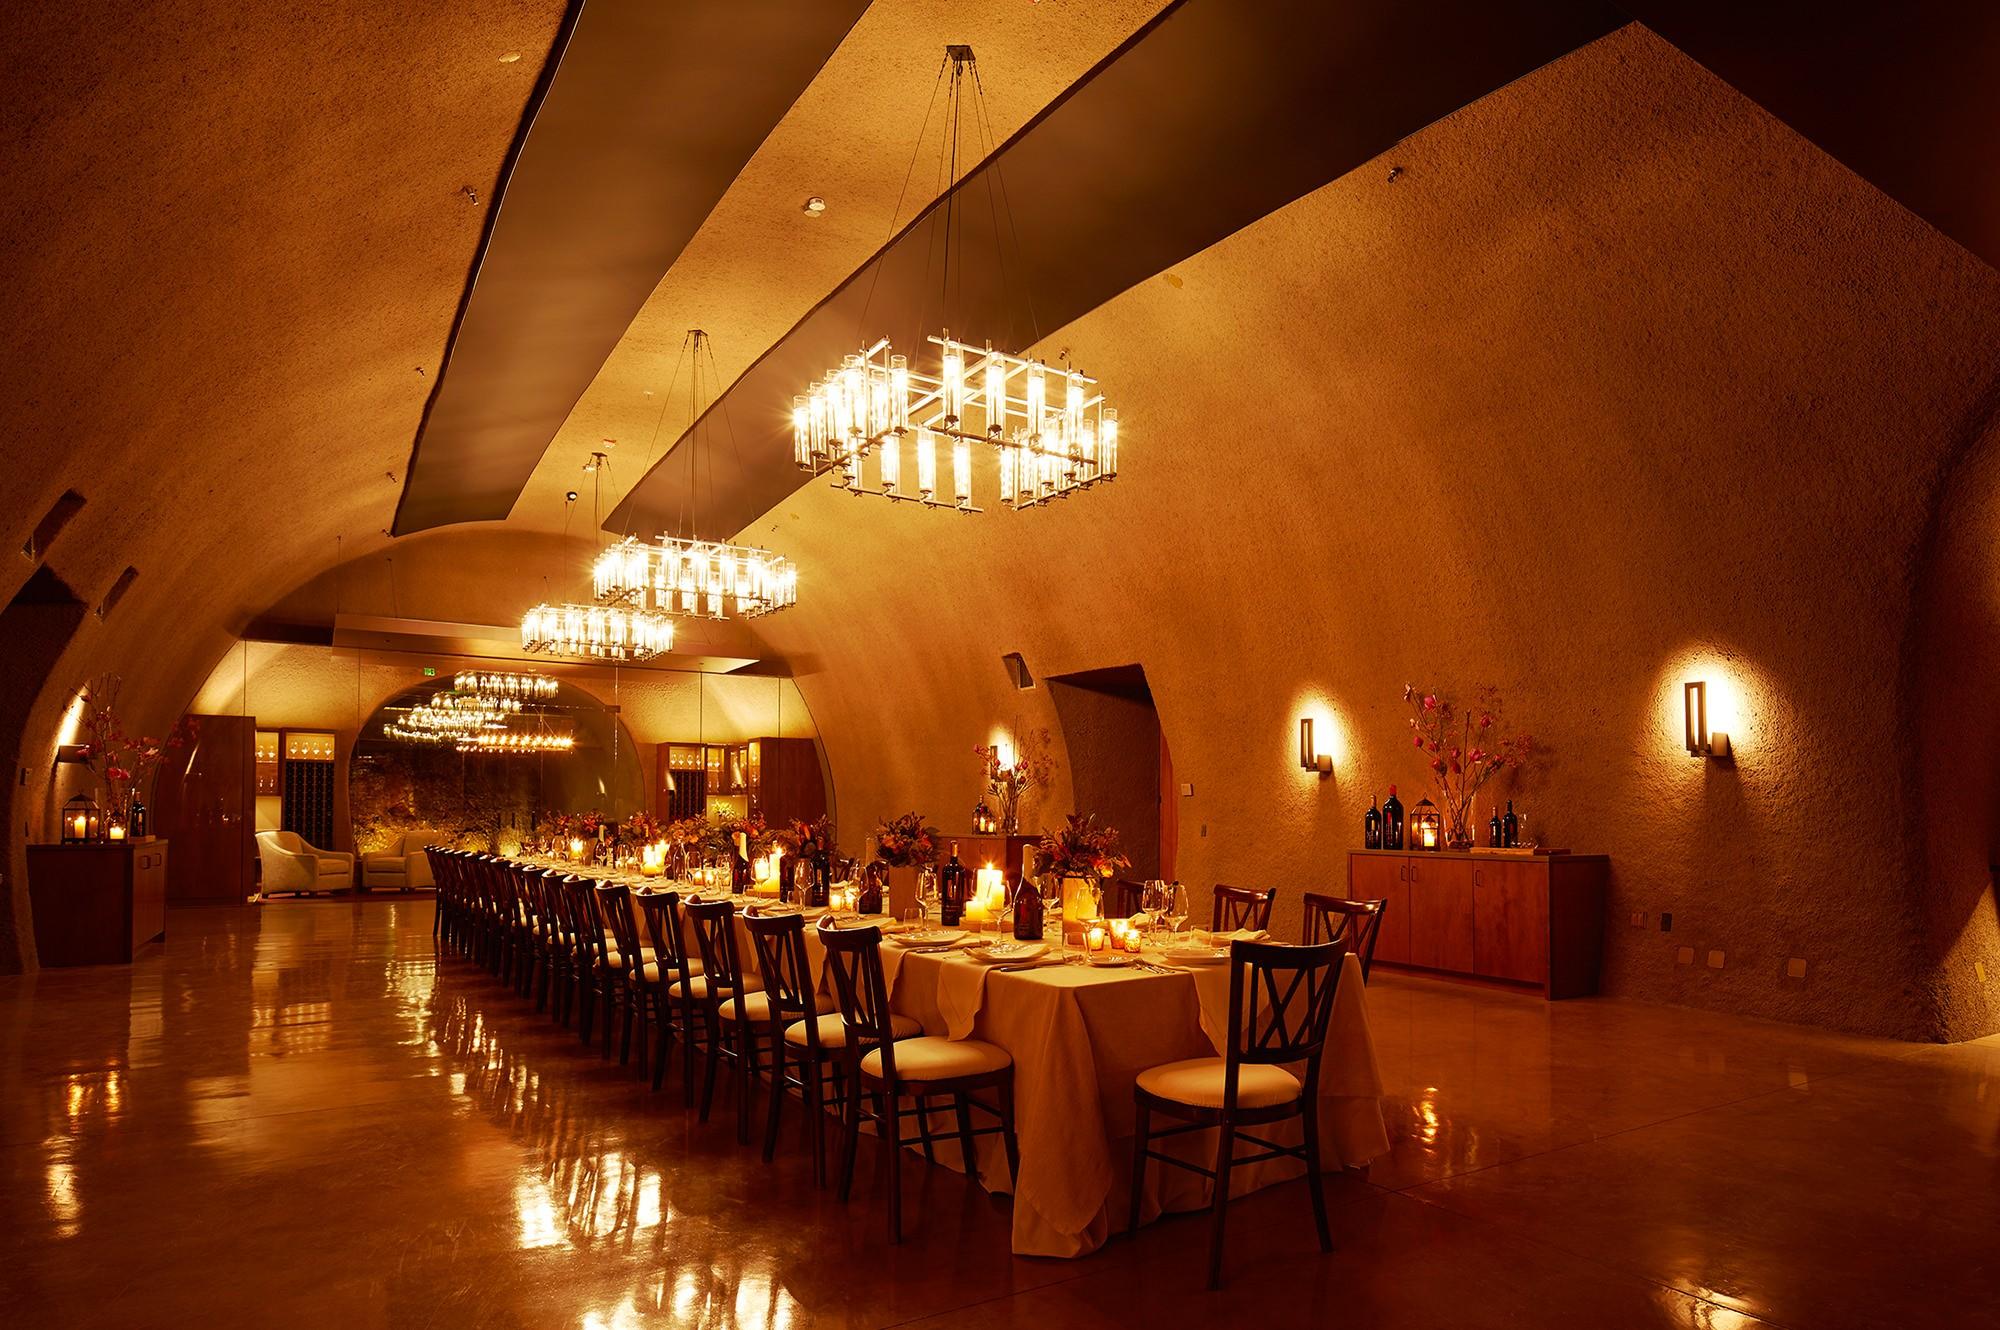 Inside main dining area at B Cellars Oakville